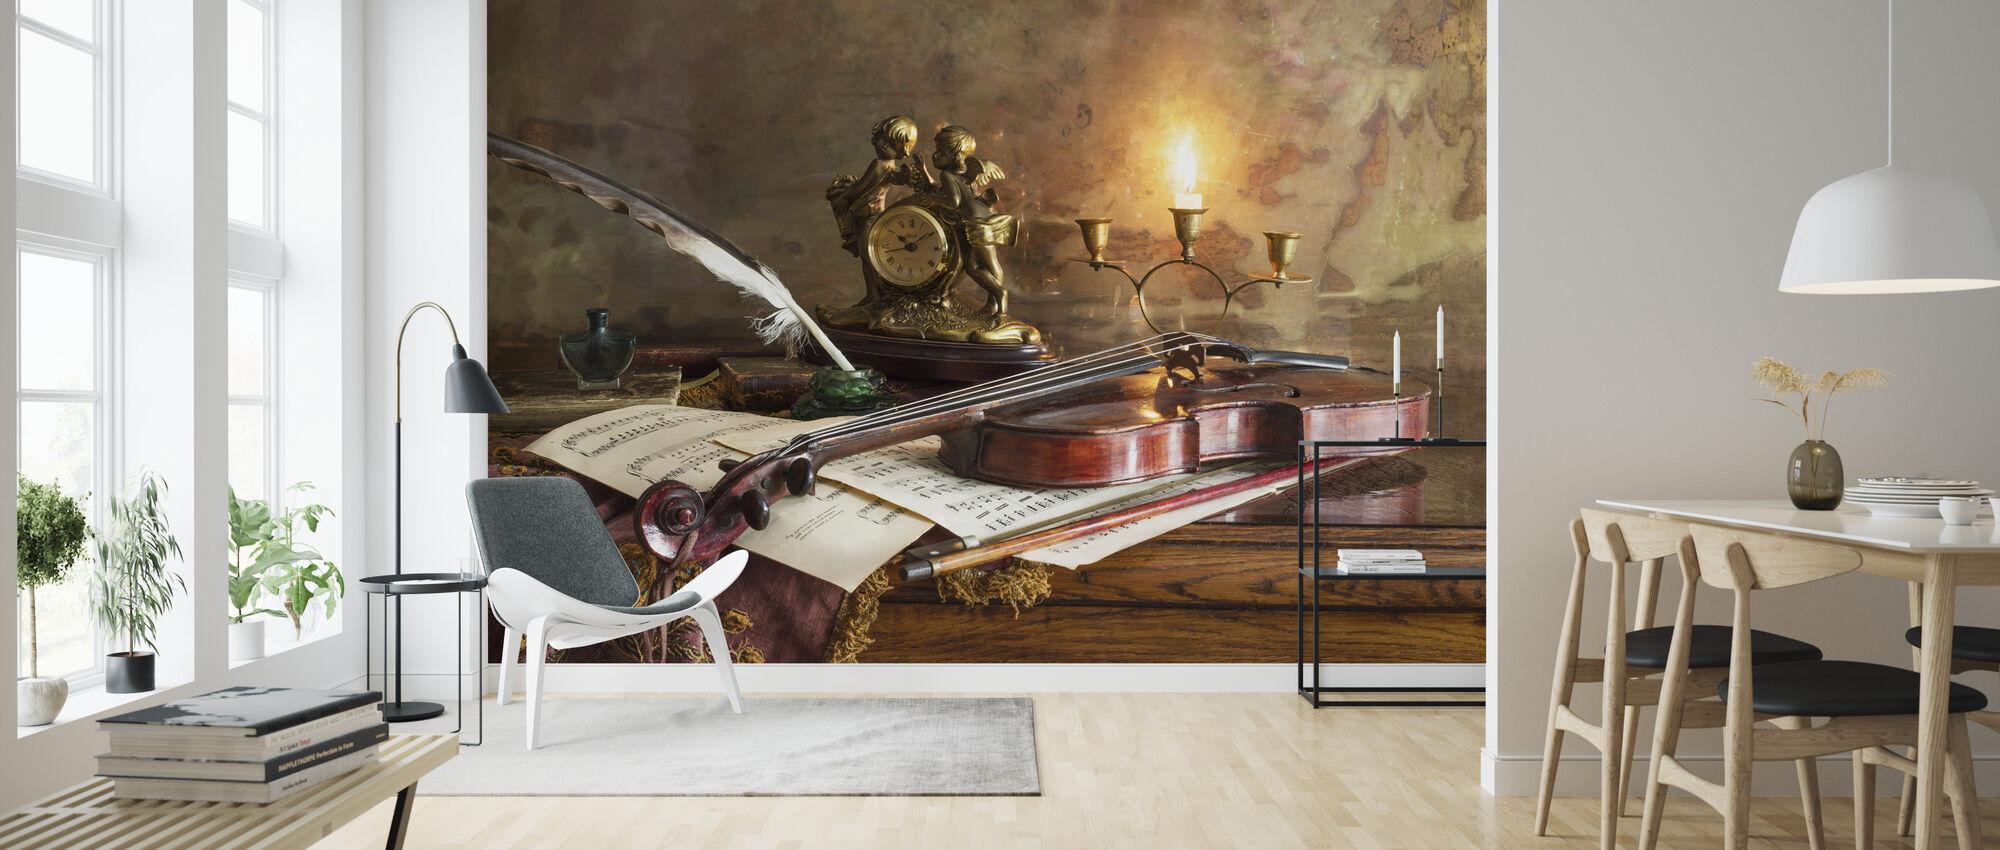 Still Life with Violin and Clock - Wallpaper - Living Room